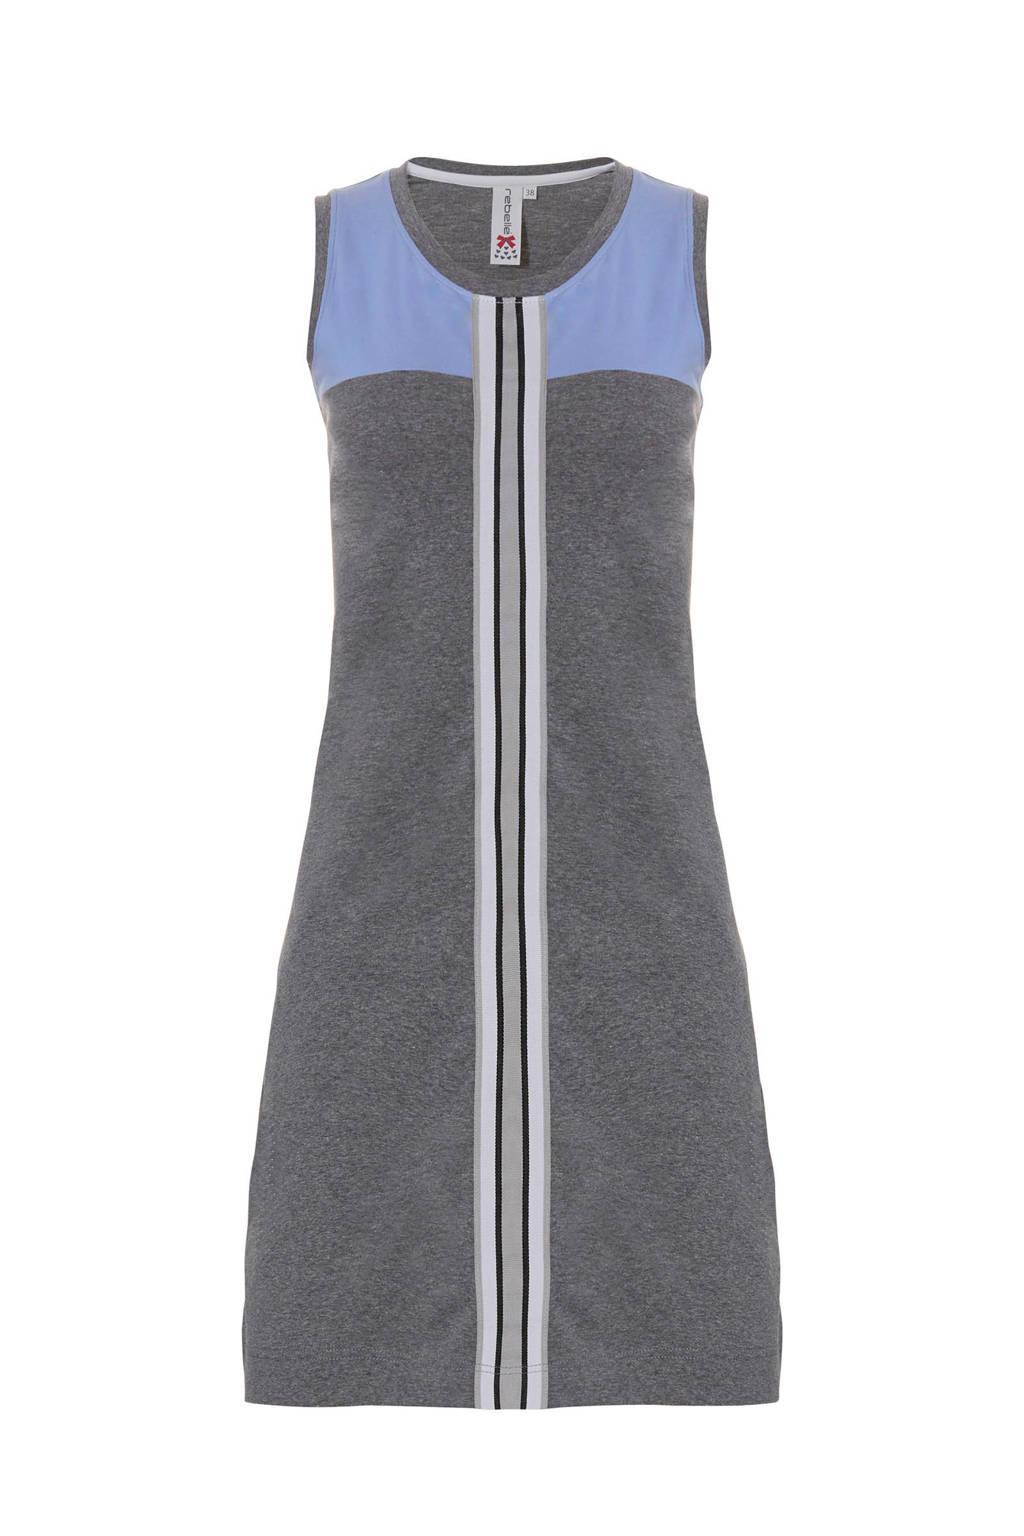 Rebelle nachthemd grijs, Grijs/blauw